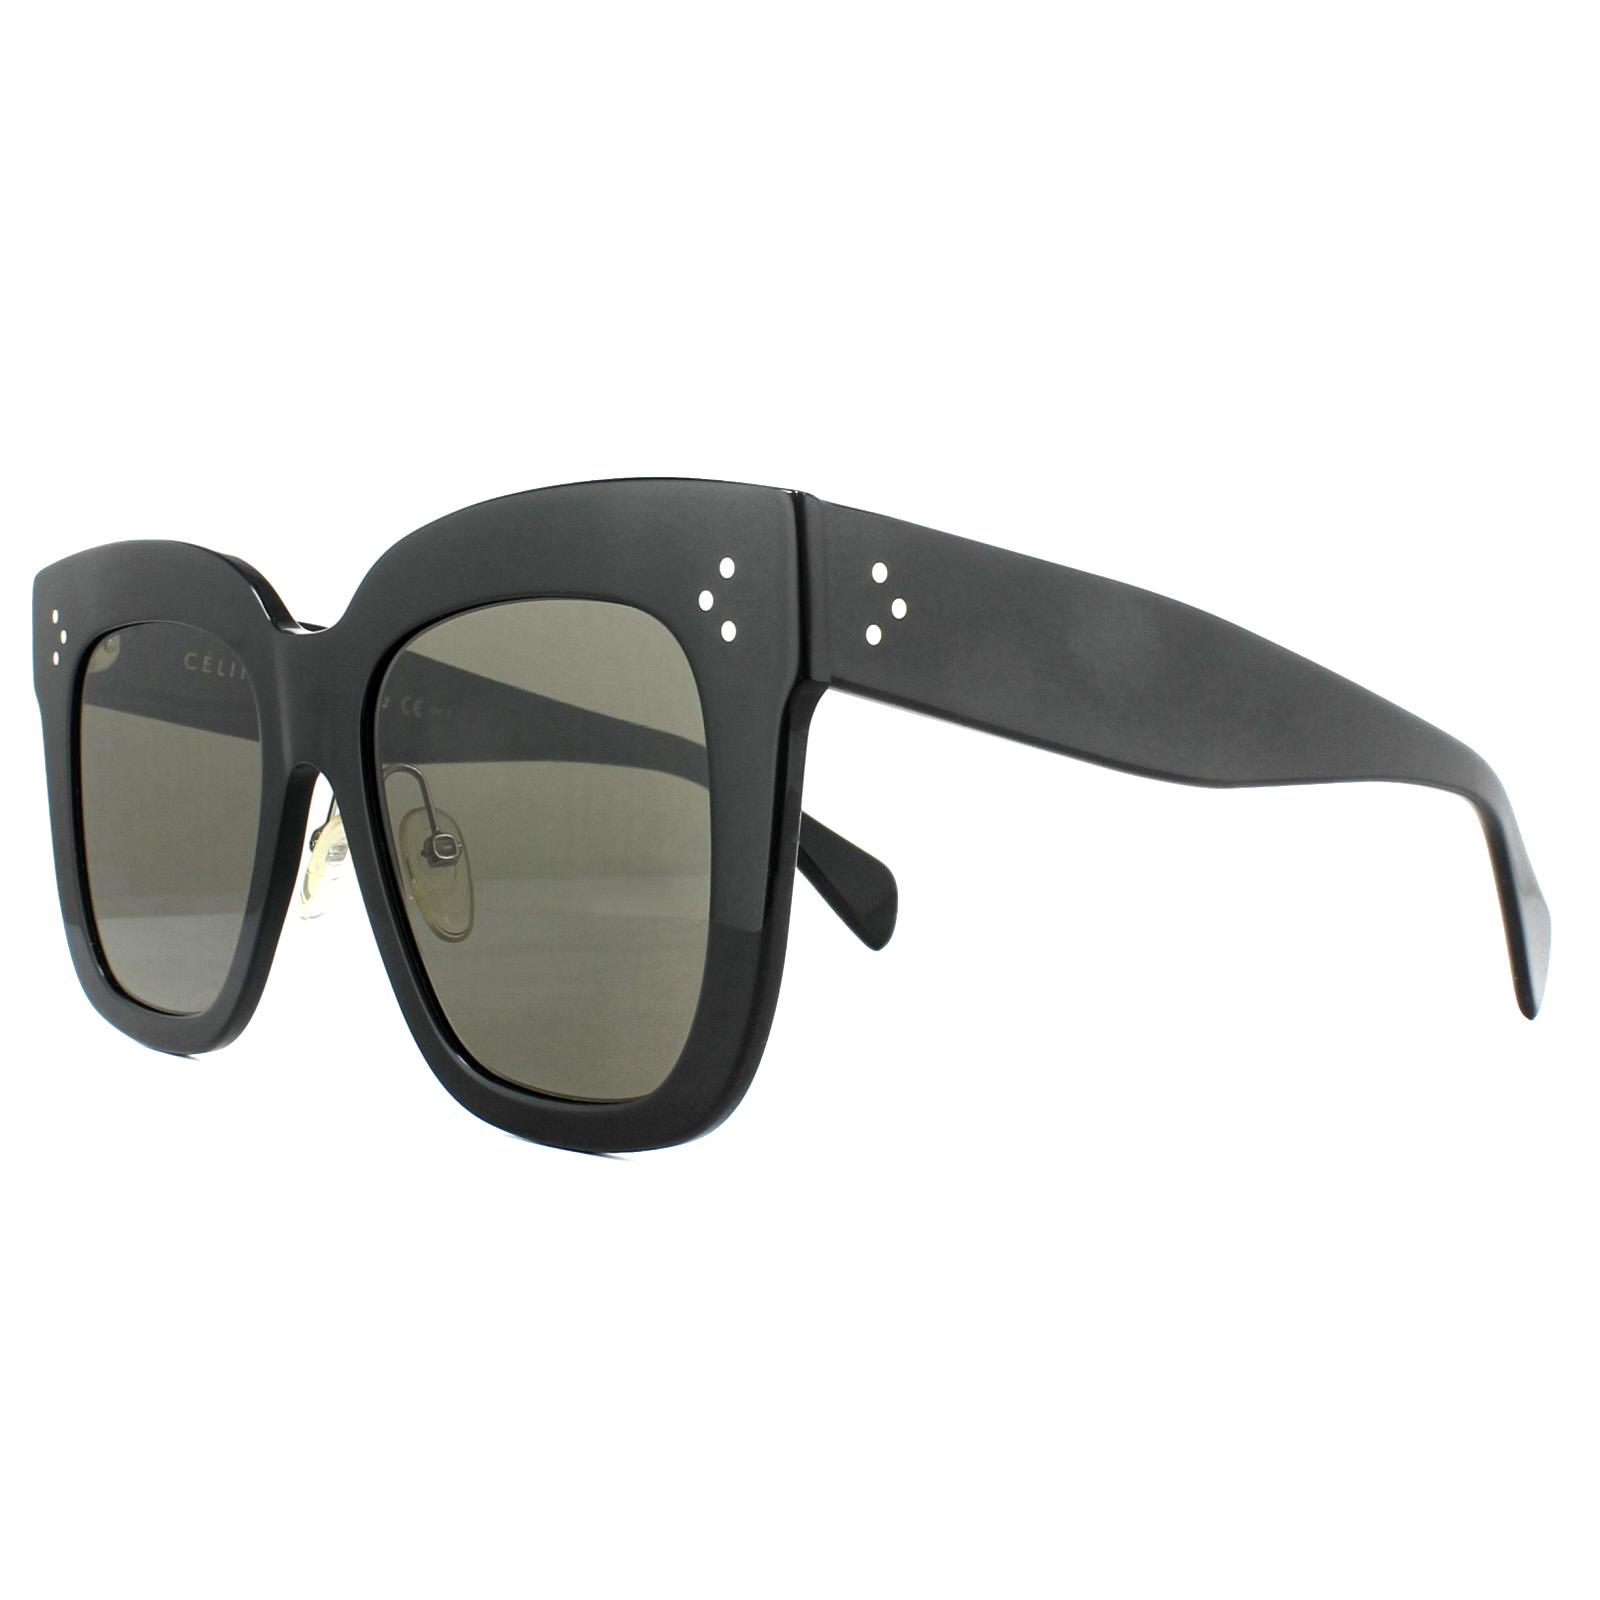 456763c01696 Cheap Celine 41444S Kim Sunglasses - Discounted Sunglasses